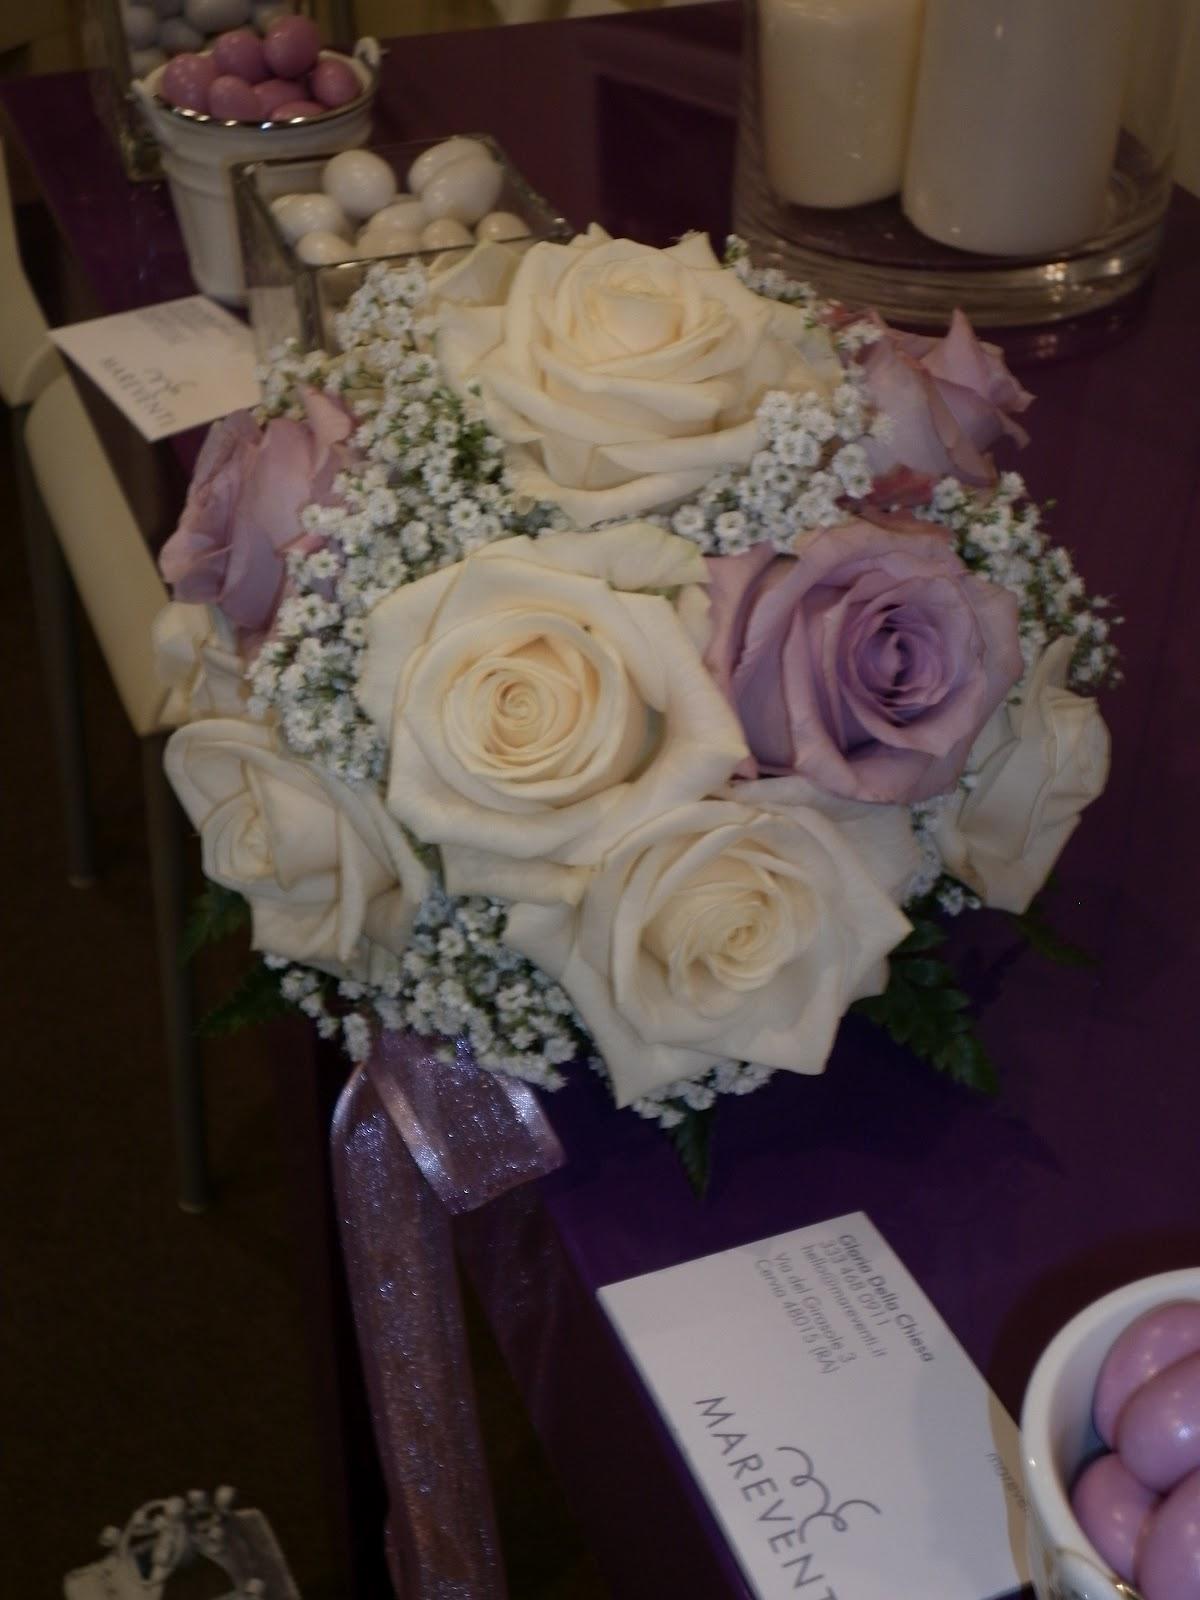 Matrimonio Country Chic Tavoli : Mareventi wedding planner ravenna allestimenti floreali